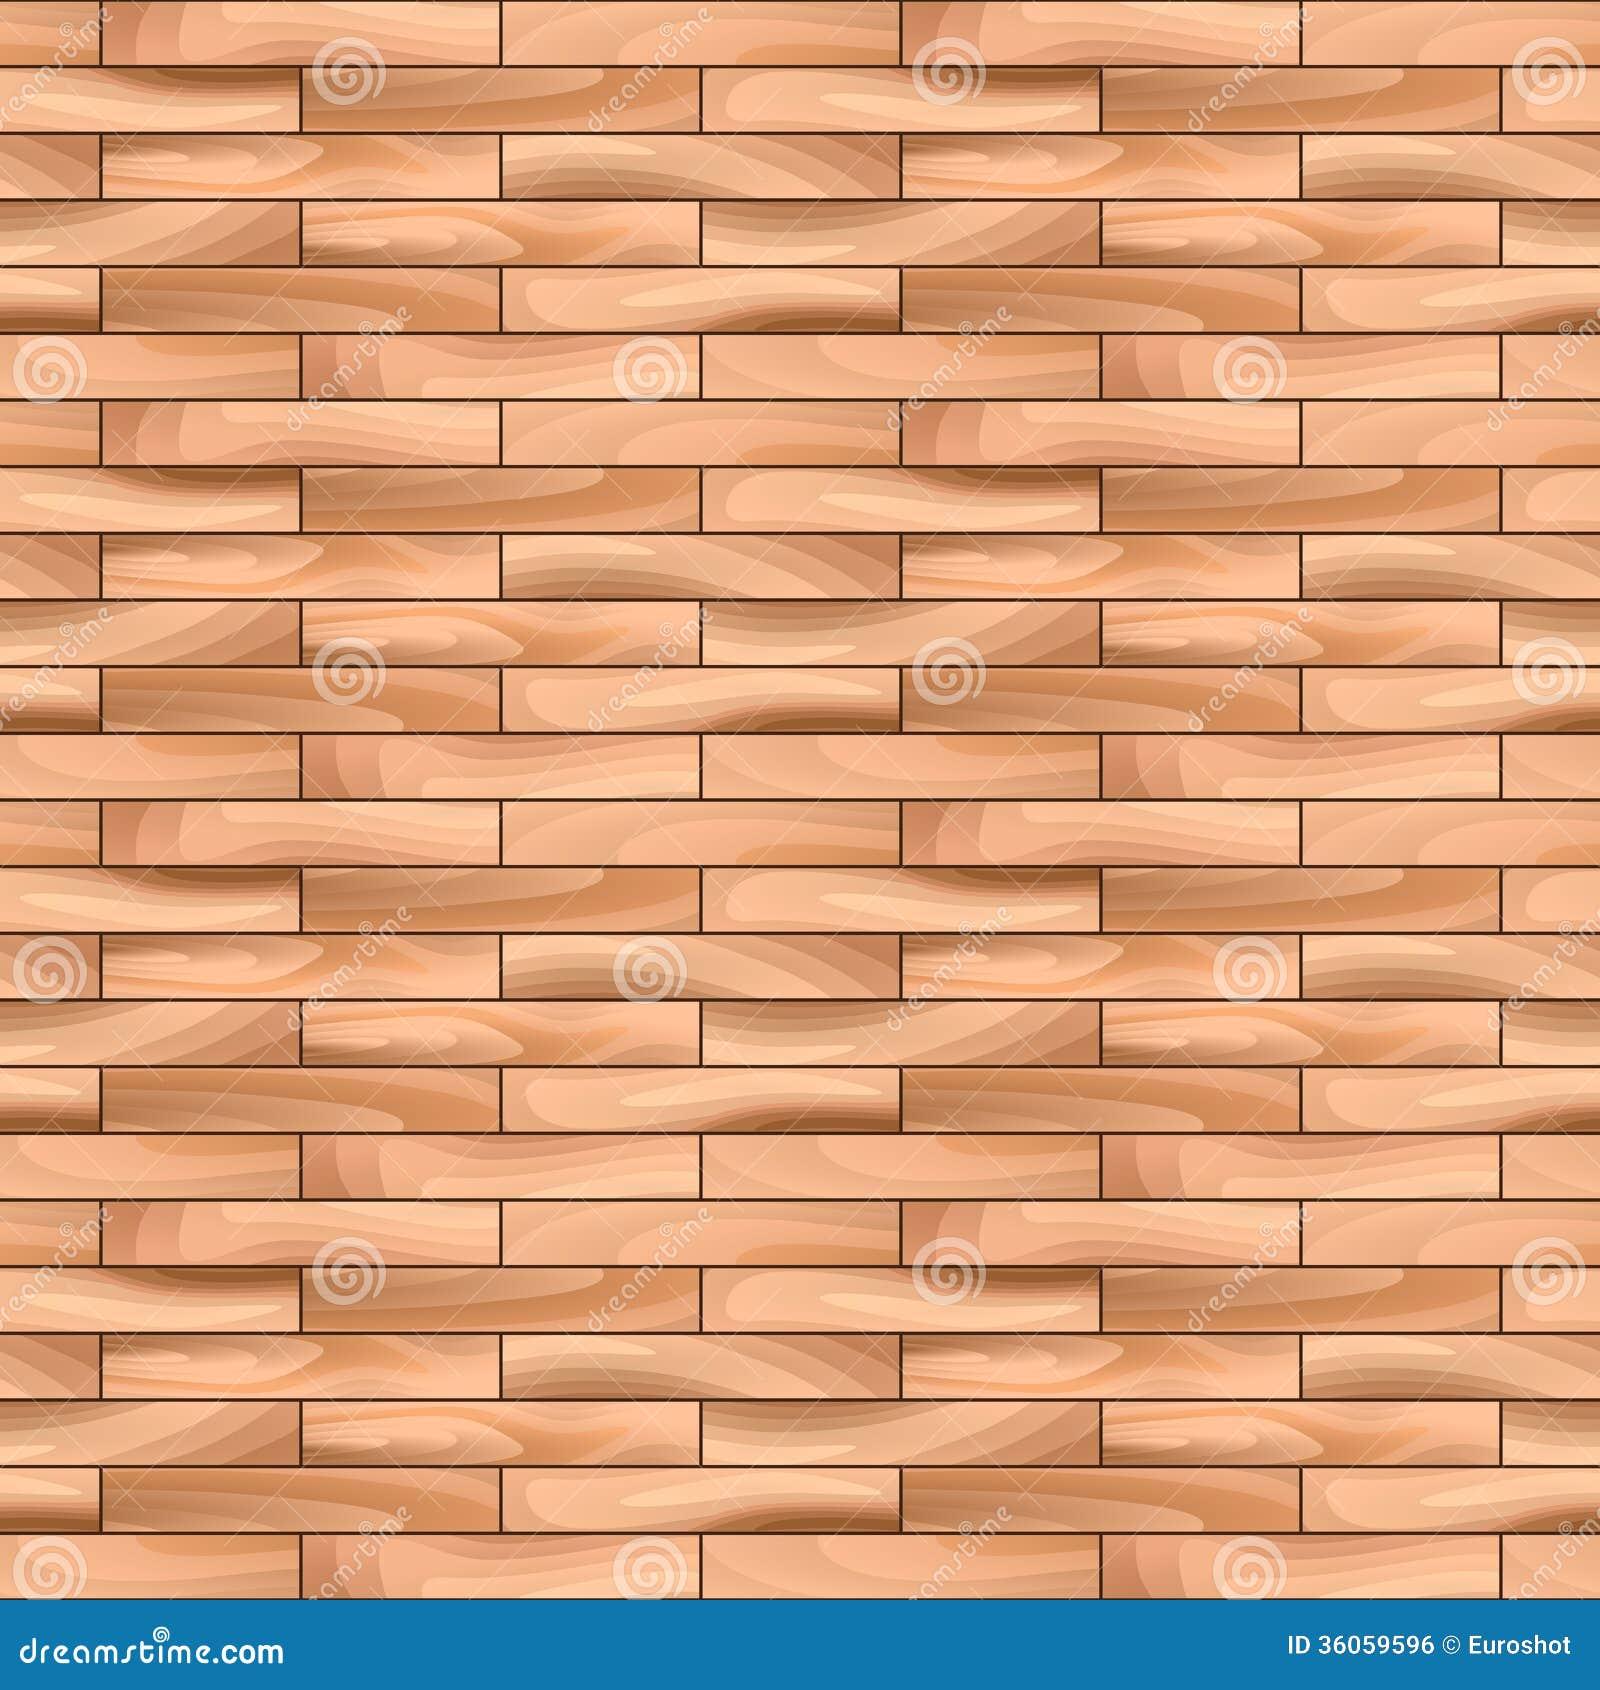 oak parquet wooden vector seamless pattern background. Black Bedroom Furniture Sets. Home Design Ideas